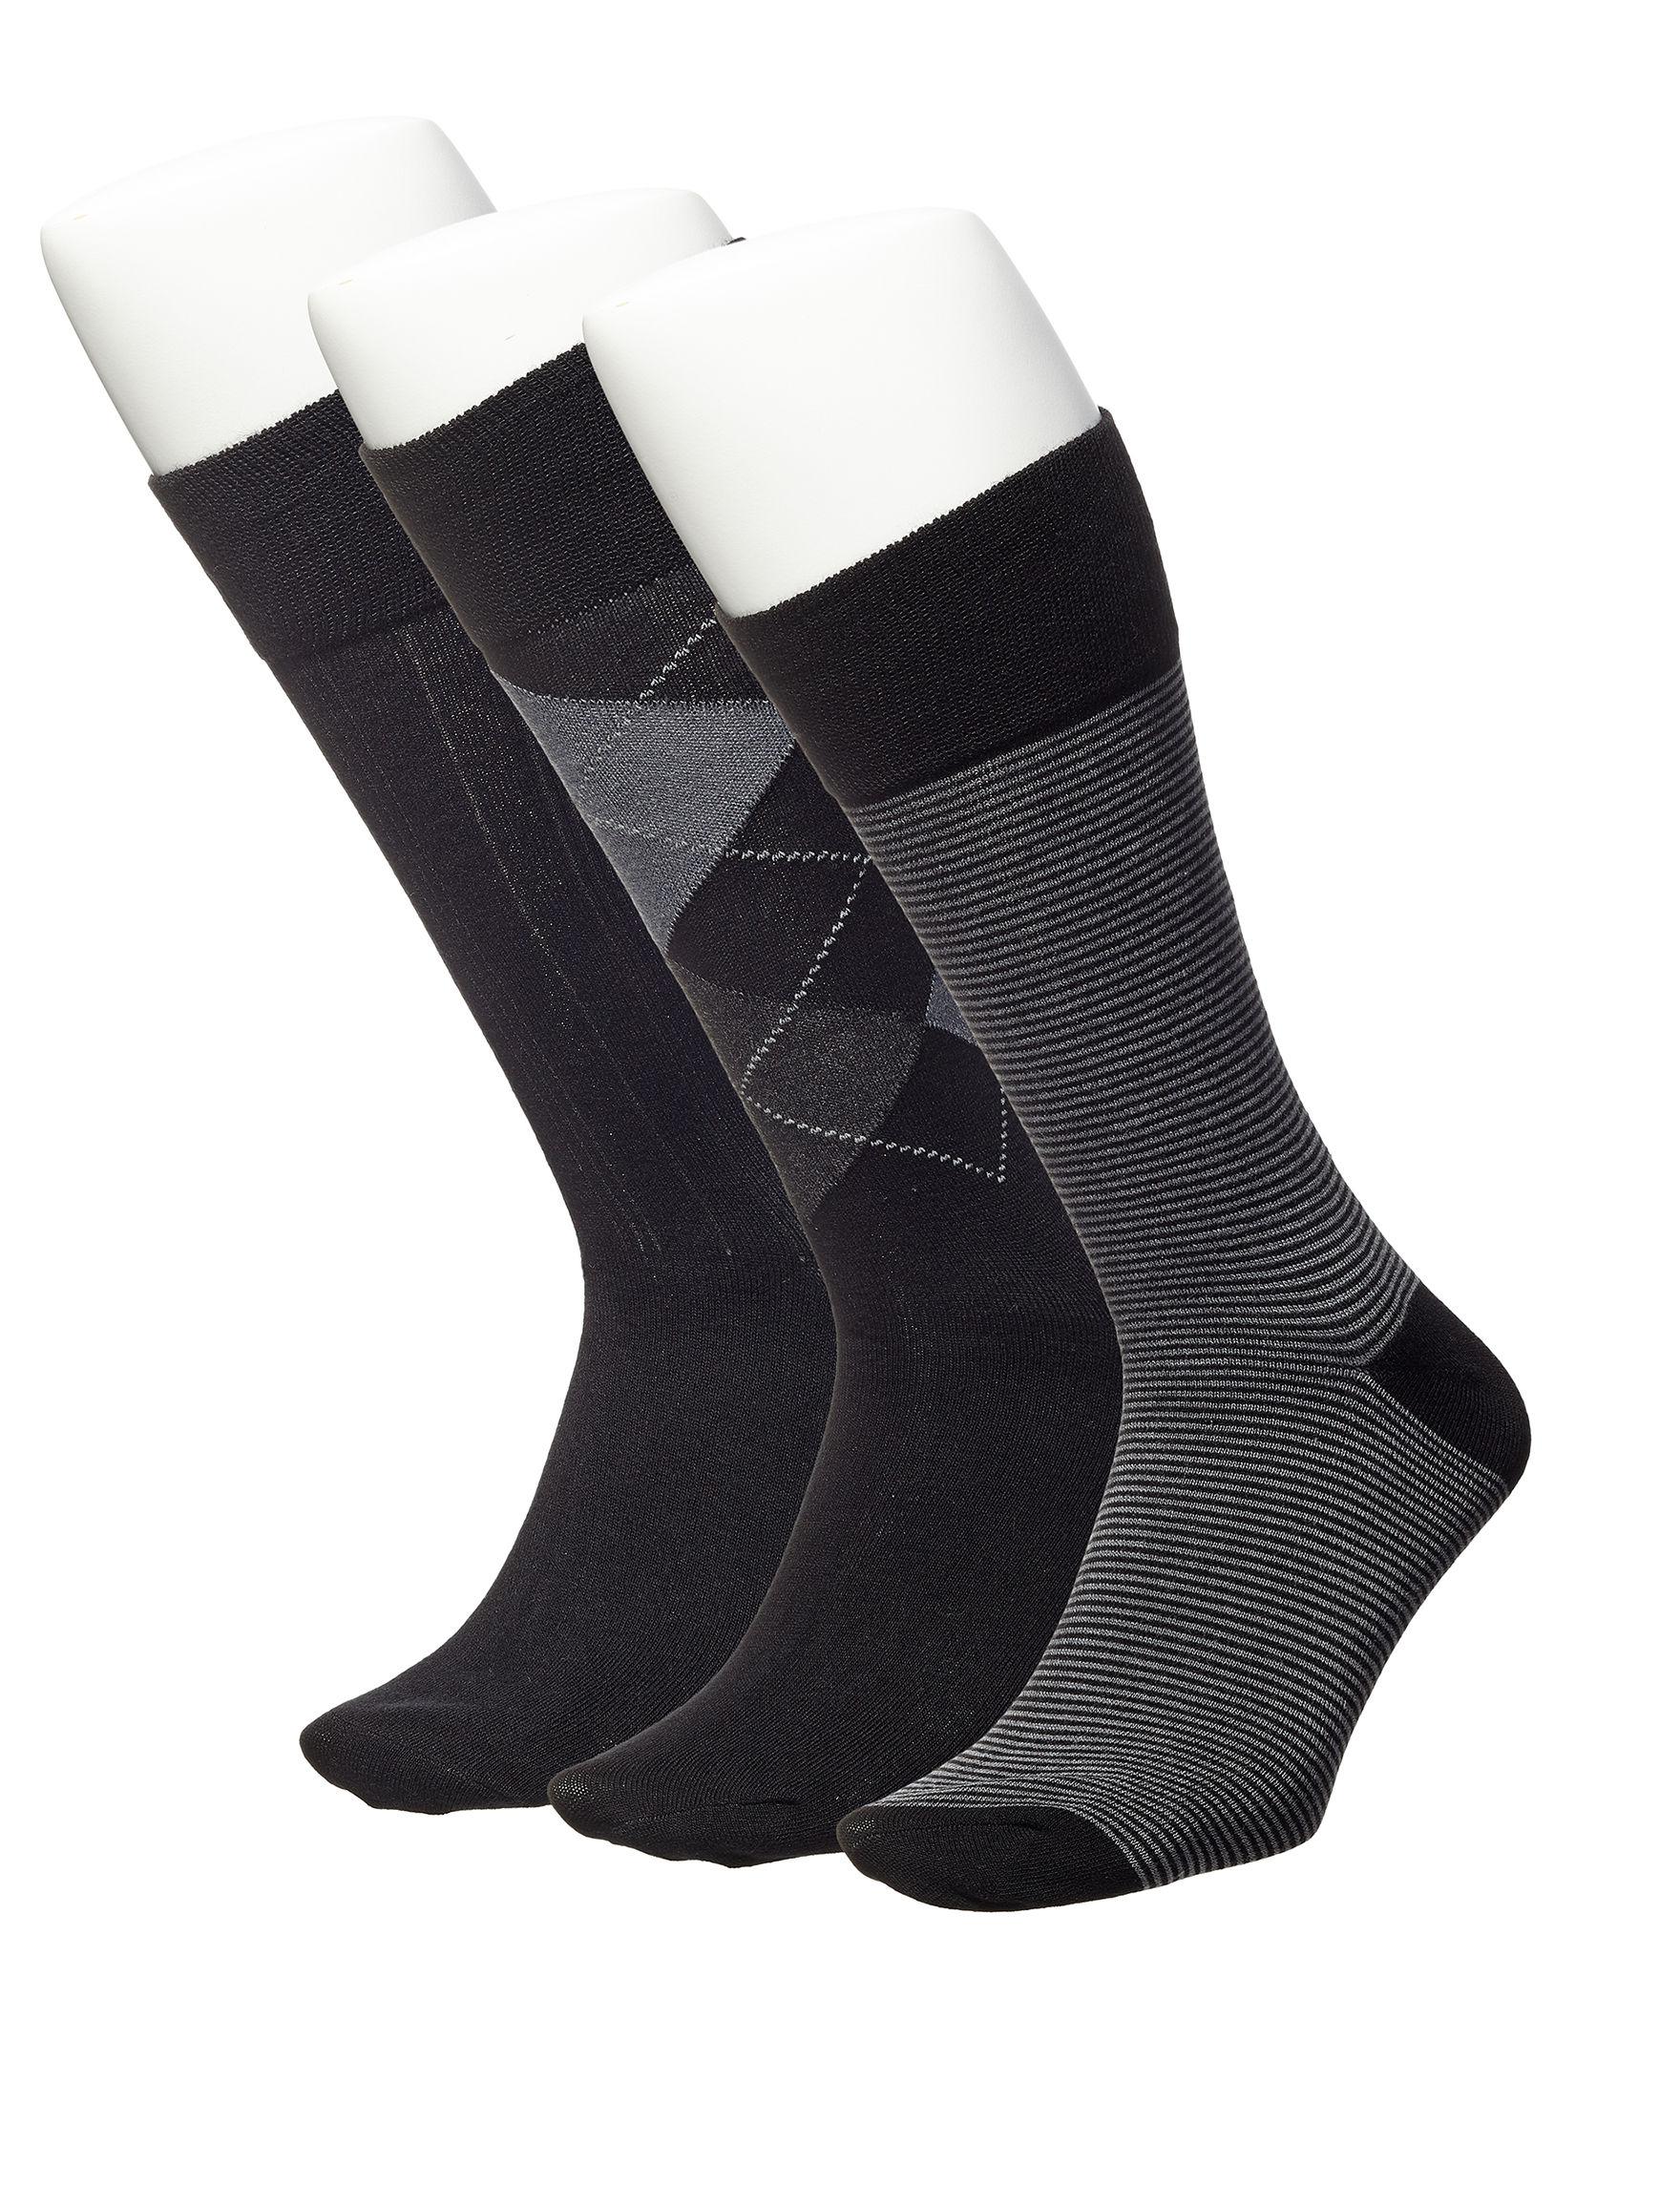 Ivy Crew Black Socks